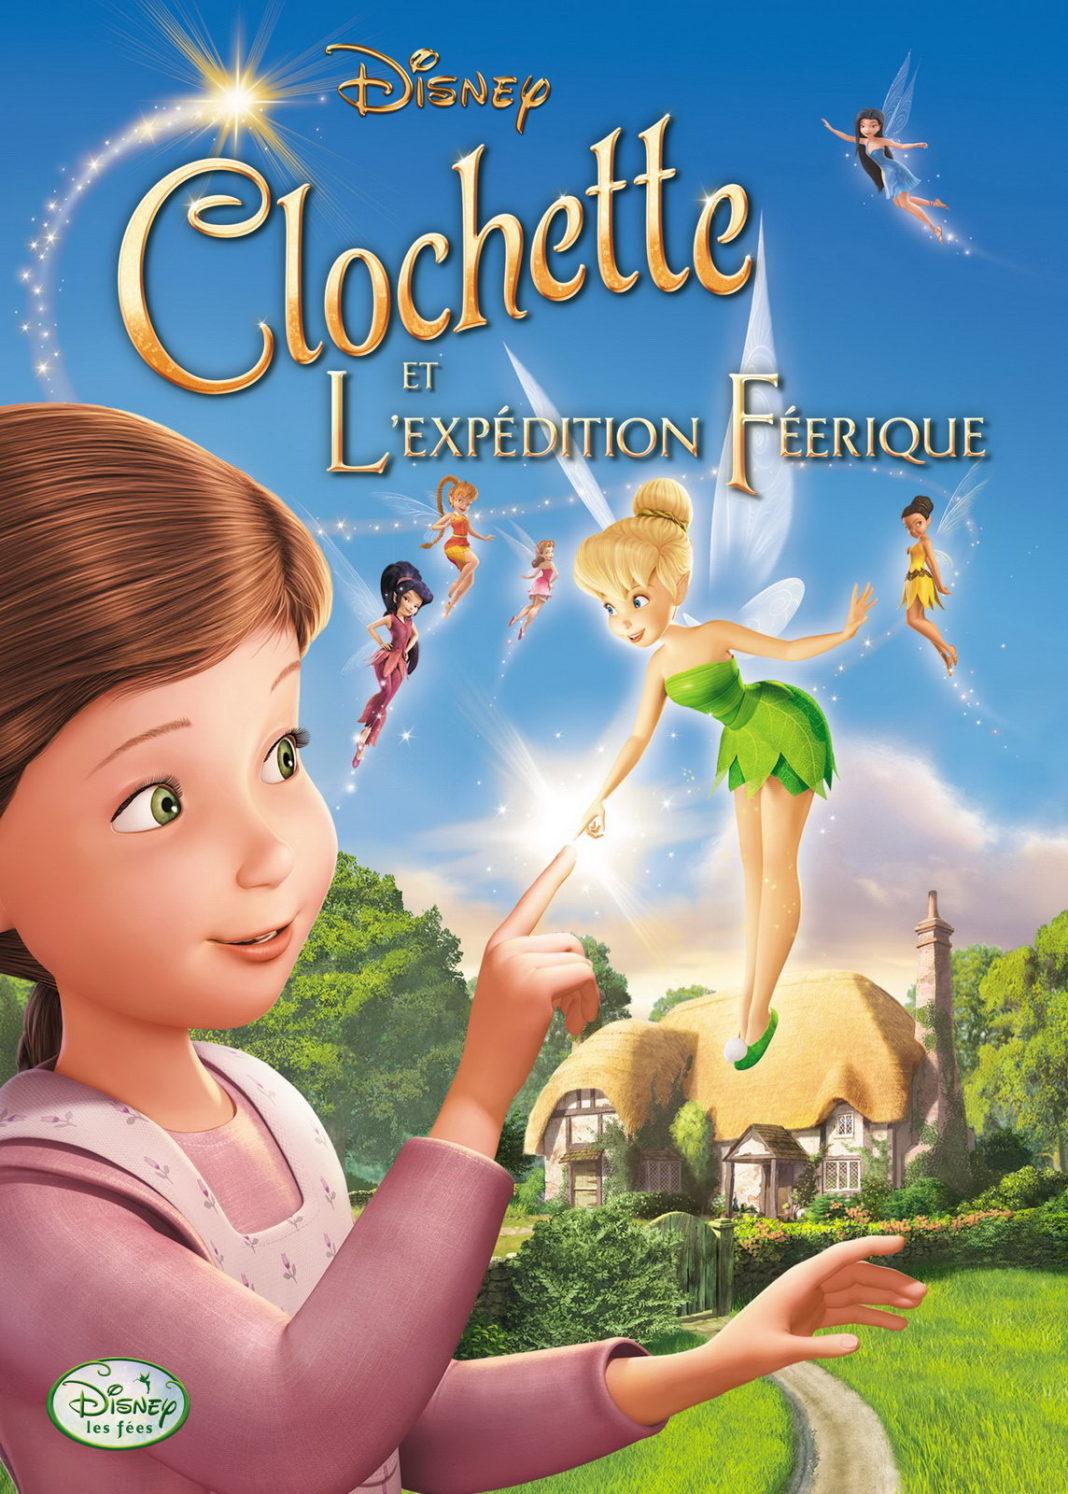 walt disney animation disneytoon studios affiche clochette expedition feerique poster tinker bell great fairy rescue